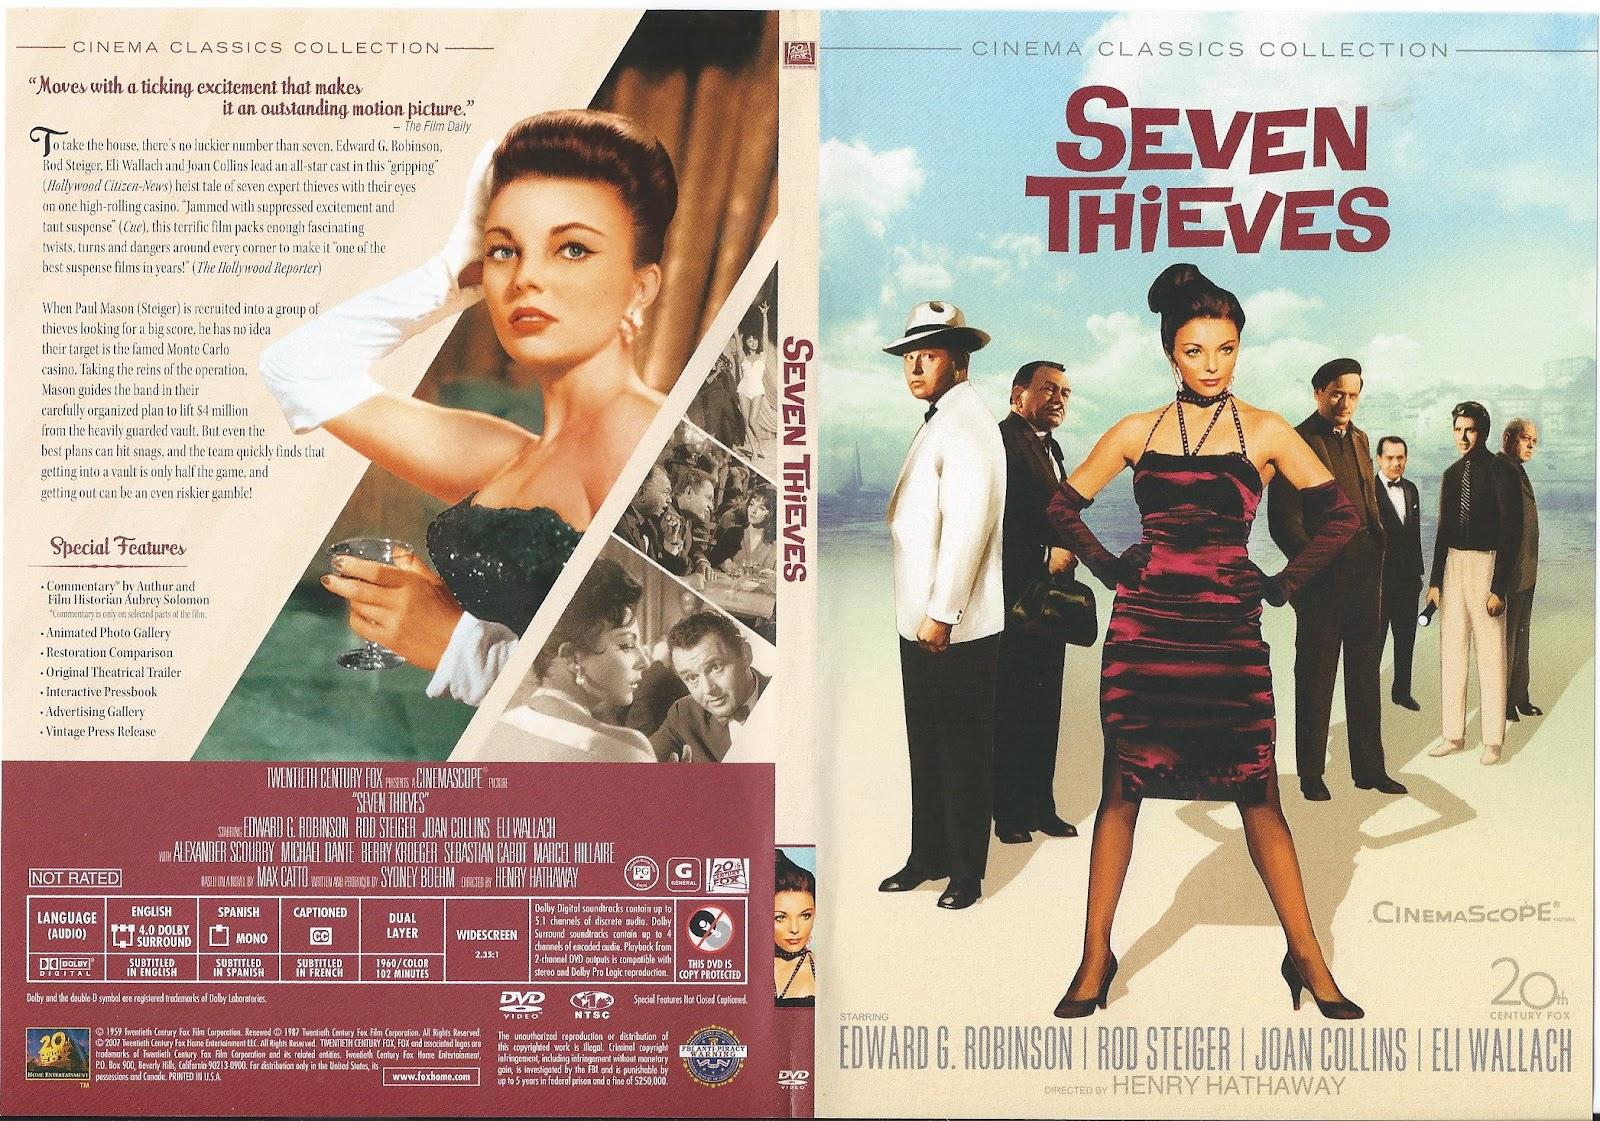 http://1.bp.blogspot.com/-akE8Vp8nqWw/UDAukxB_9KI/AAAAAAAAMy4/BwY1YTLaE2c/s1600/dvd+thieves+1.jpg